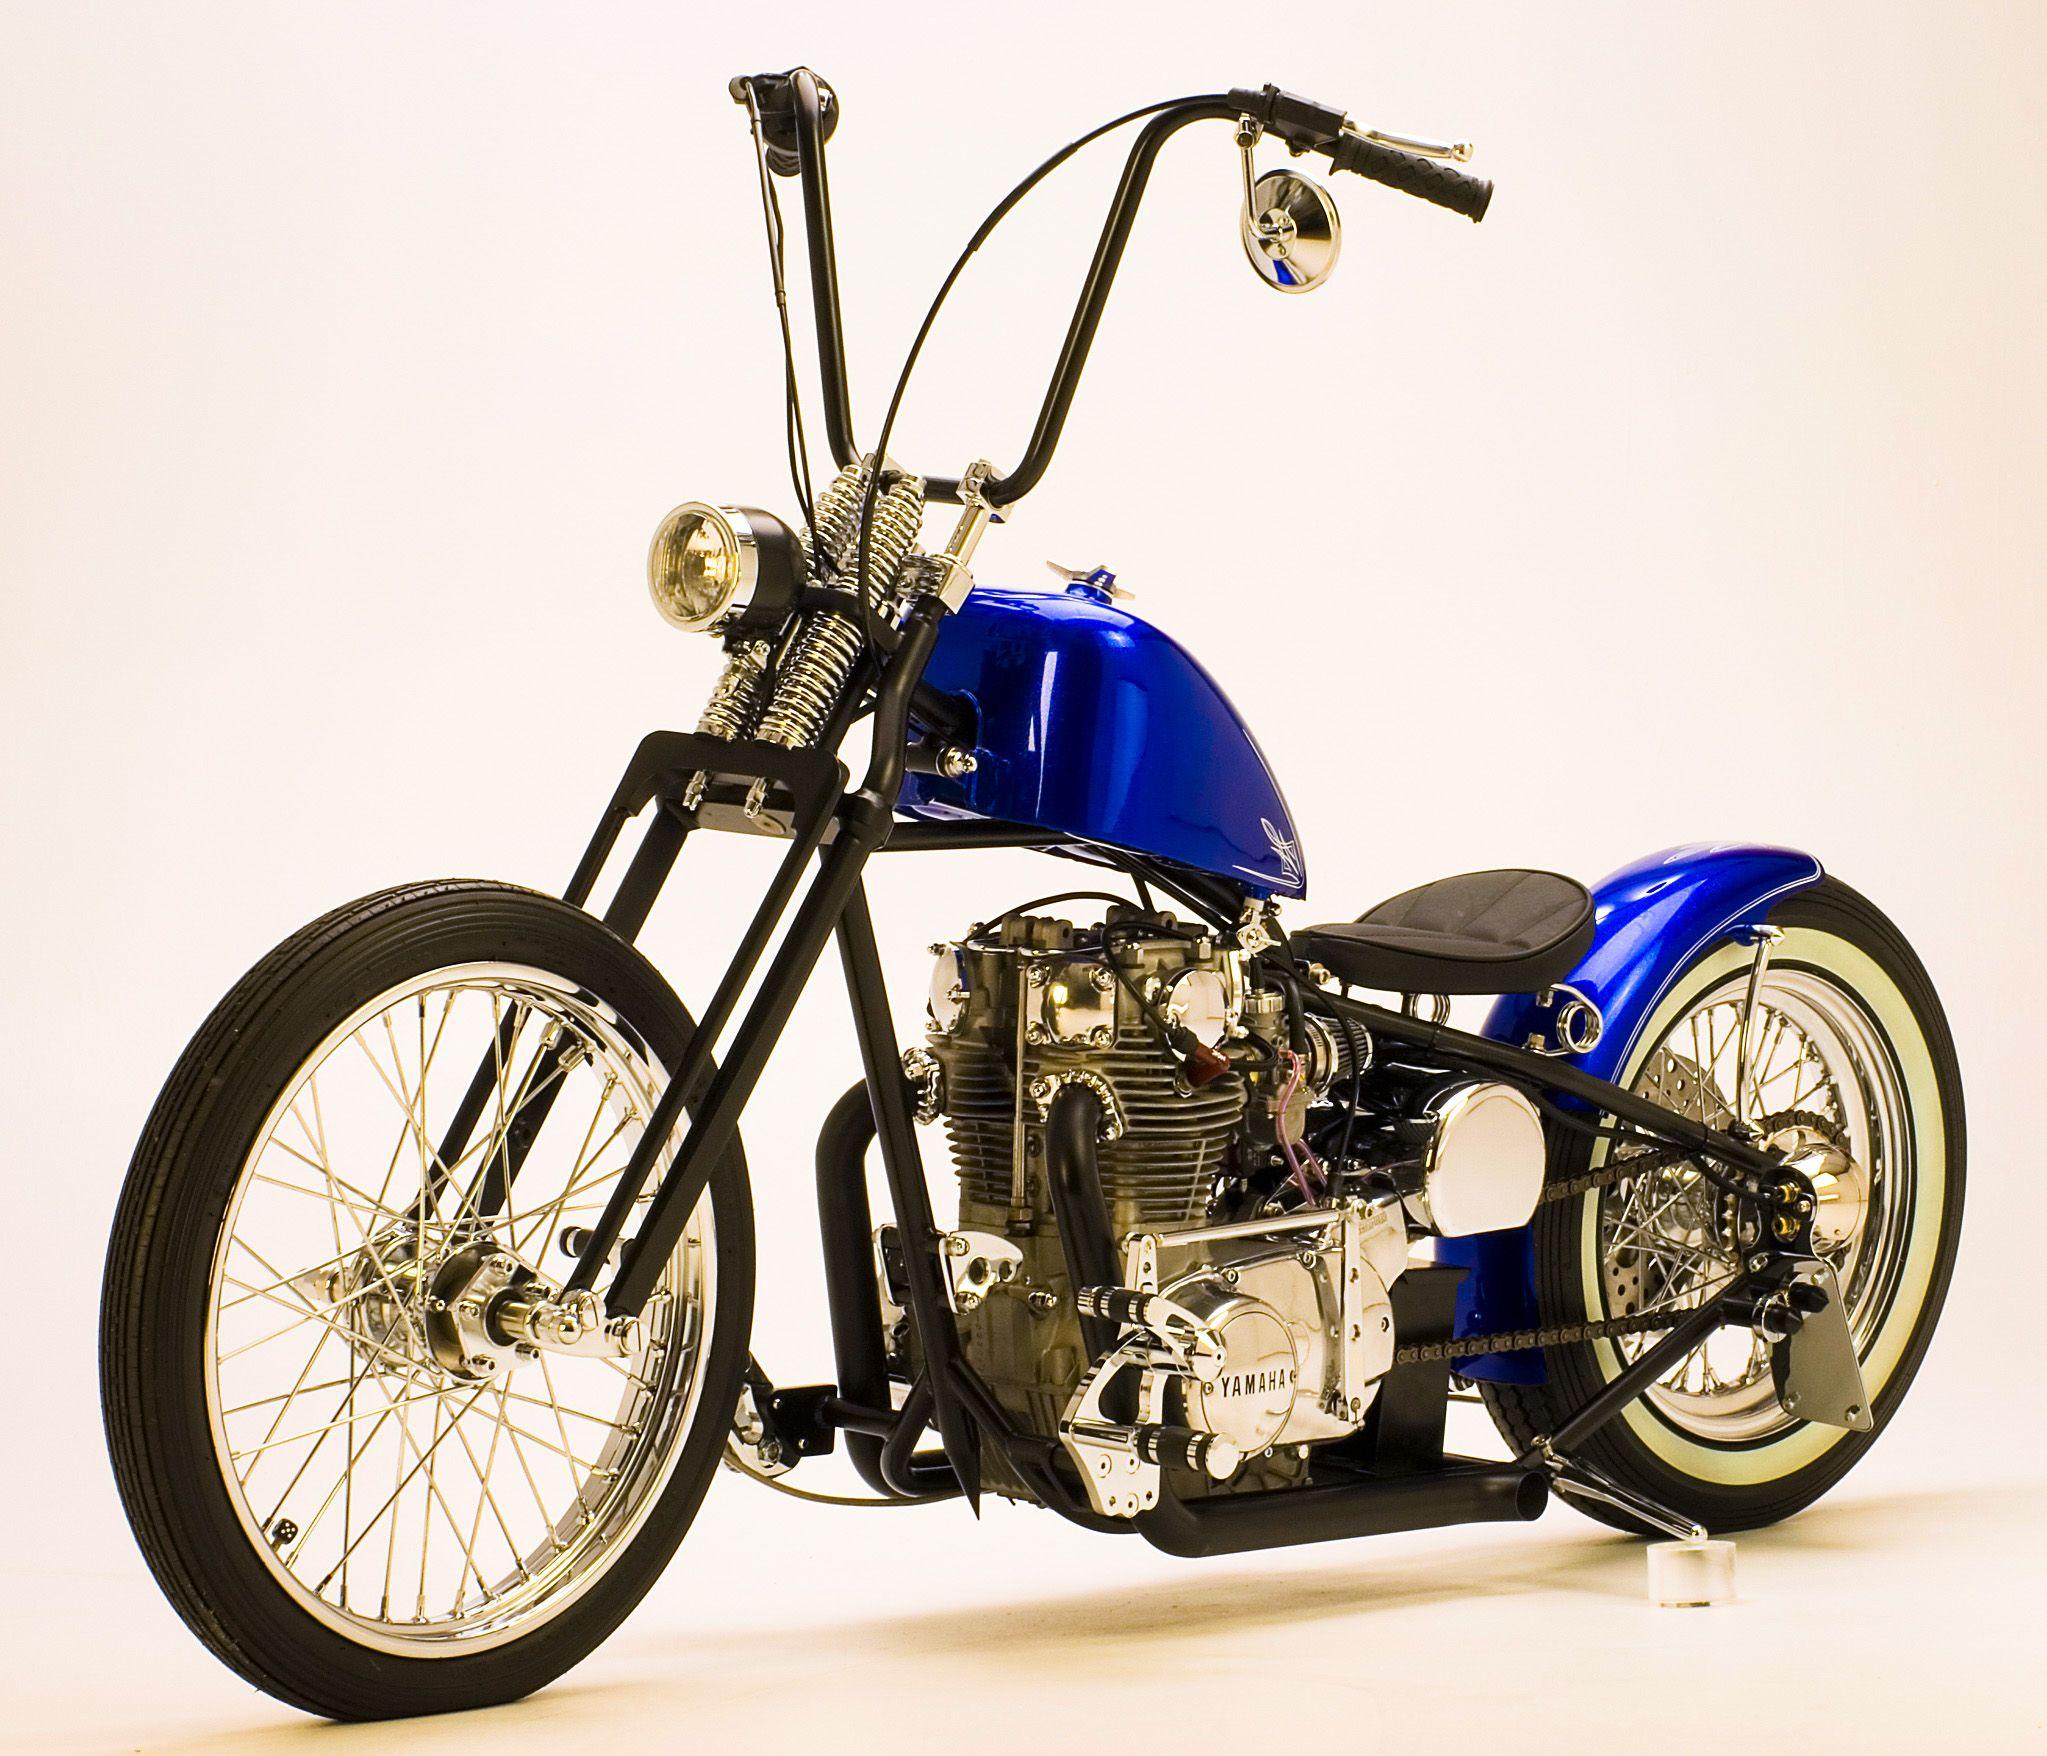 Ardcore XS650 Chopper / Bobber. Http://scottscustomcycles